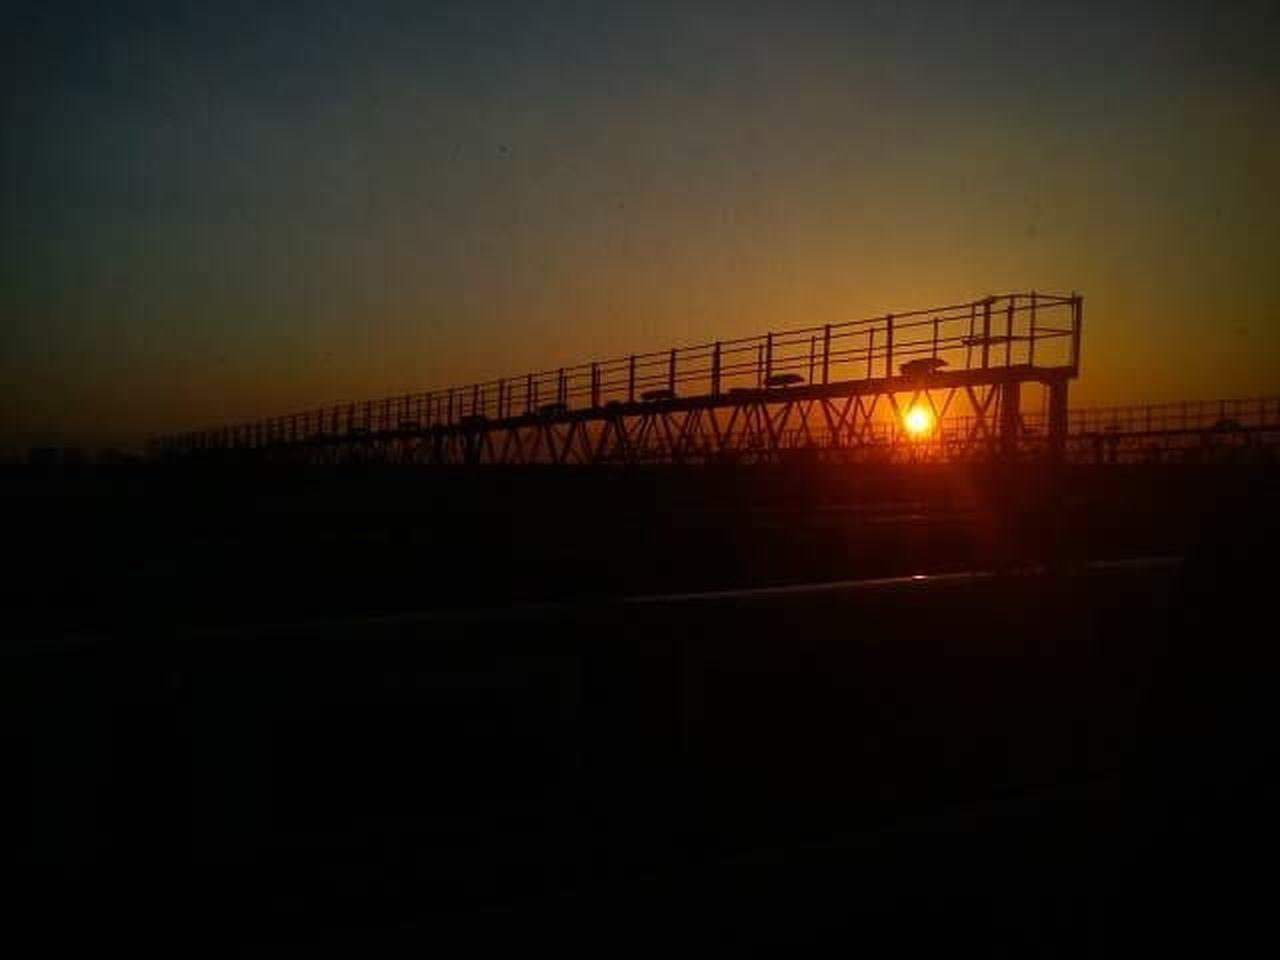 sunset, silhouette, sun, outdoors, sky, no people, nature, scenics, illuminated, beauty in nature